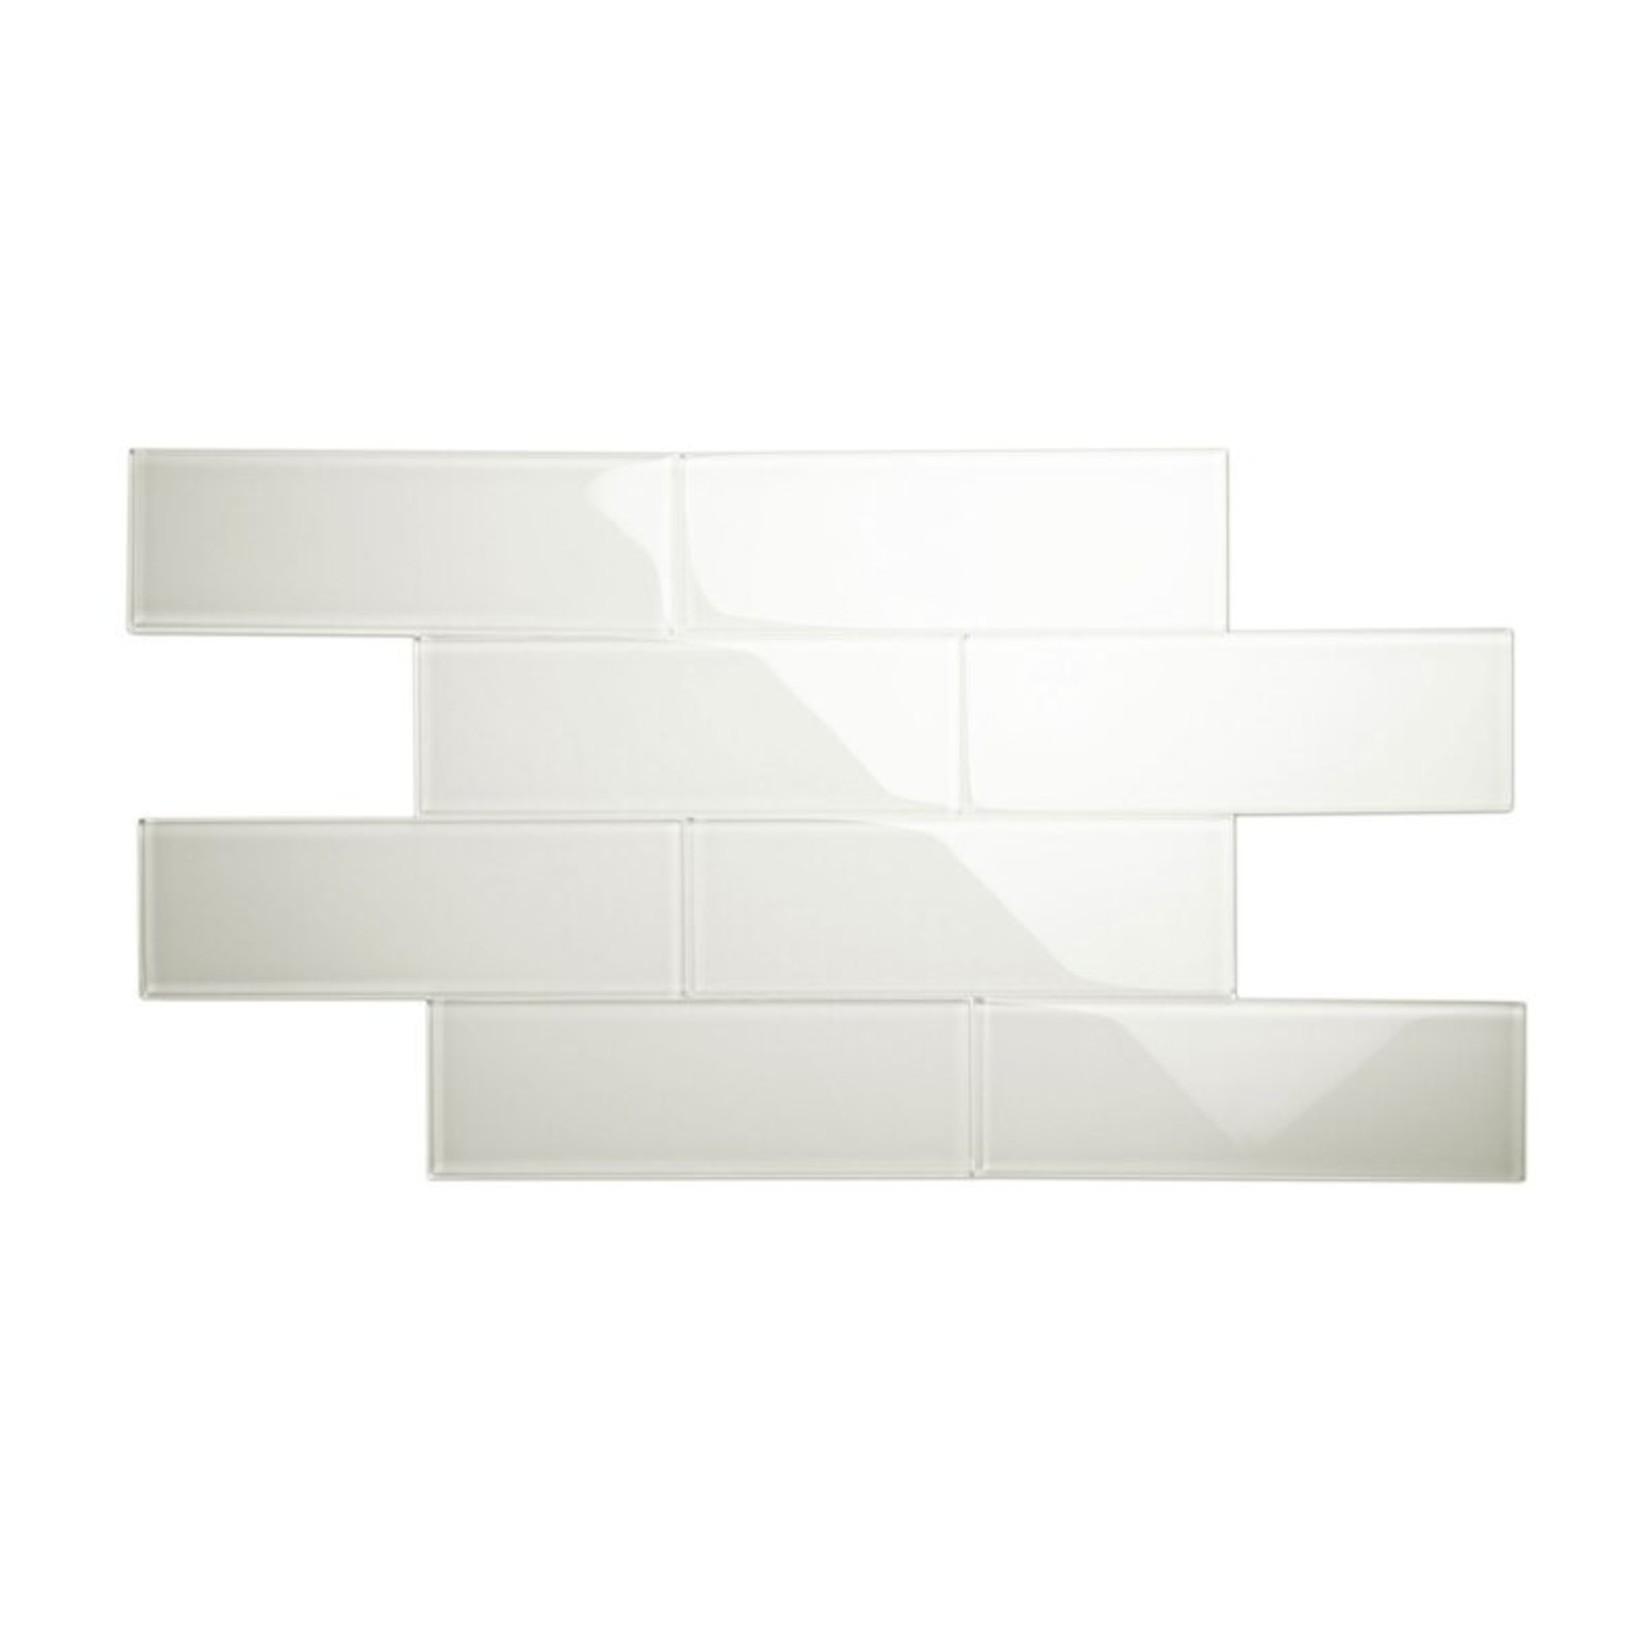 "*Premium 4"" x 12"" Glass Subway Tile - Moonlight Grey"